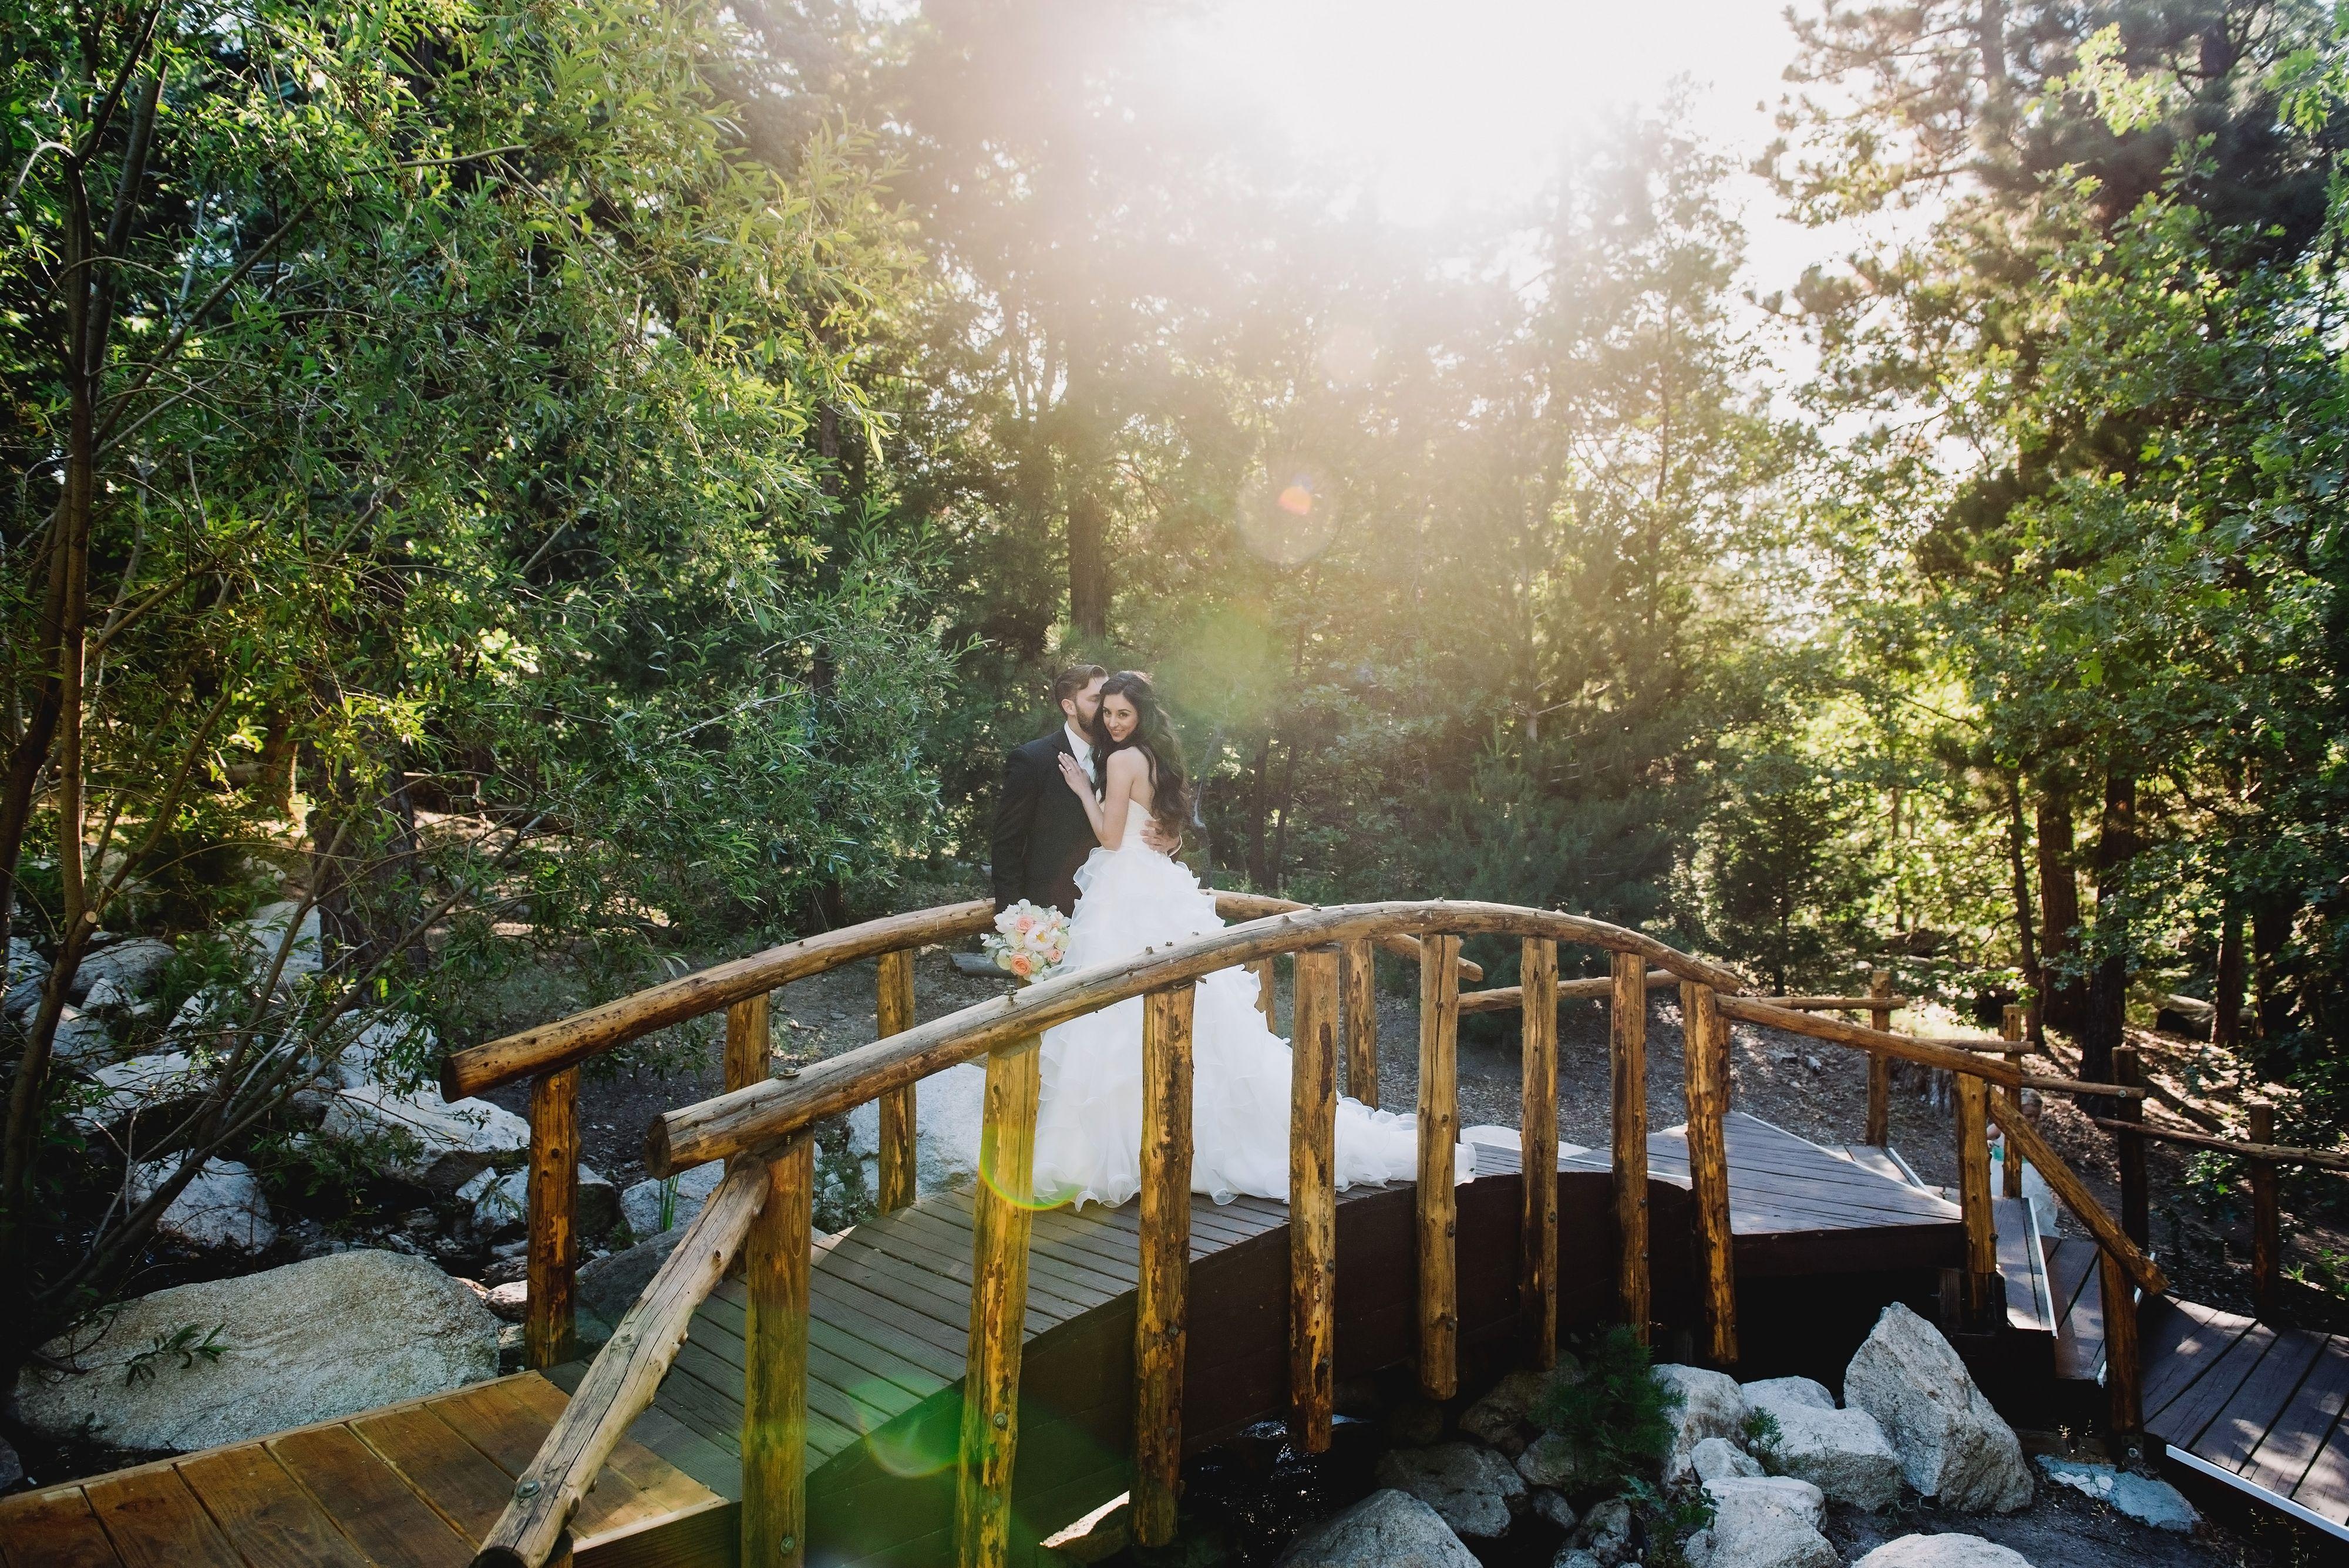 Mountain Forest wedding at Bridge Pine Rose cabins california